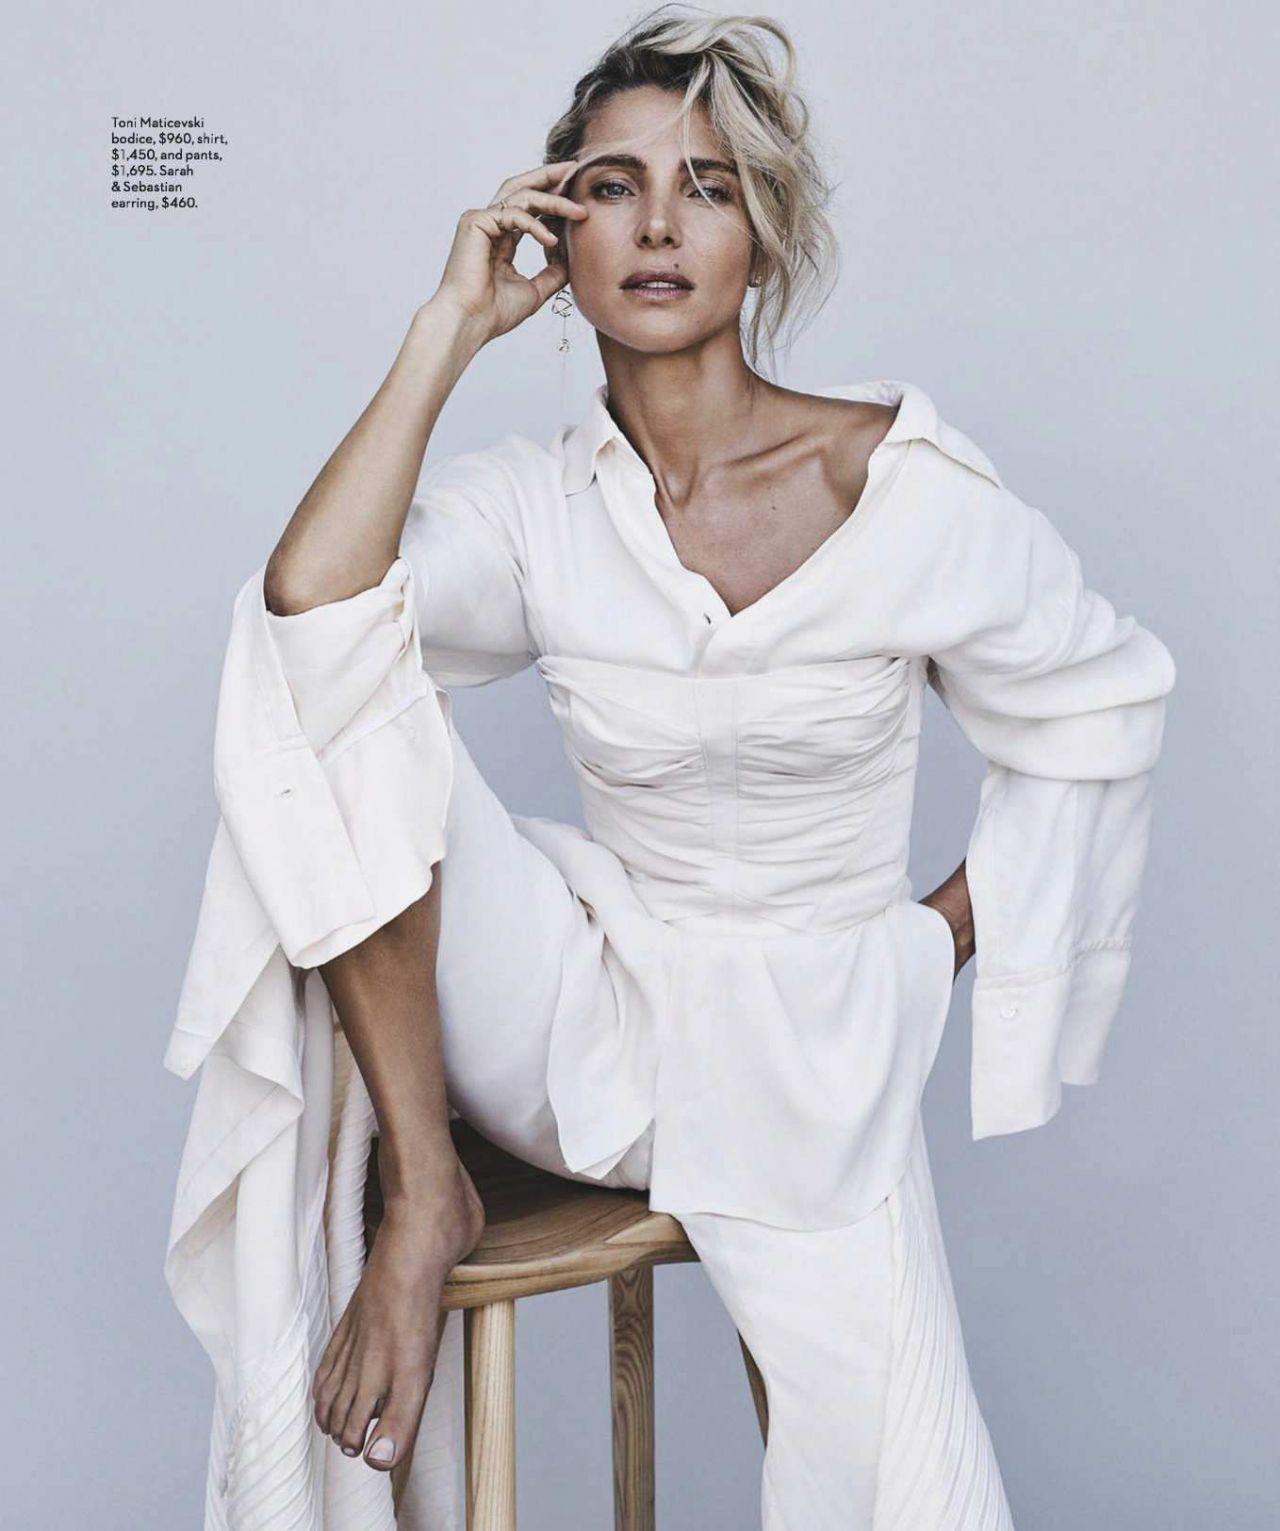 Elsa Pataky Vogue Australia May 2018 Issue